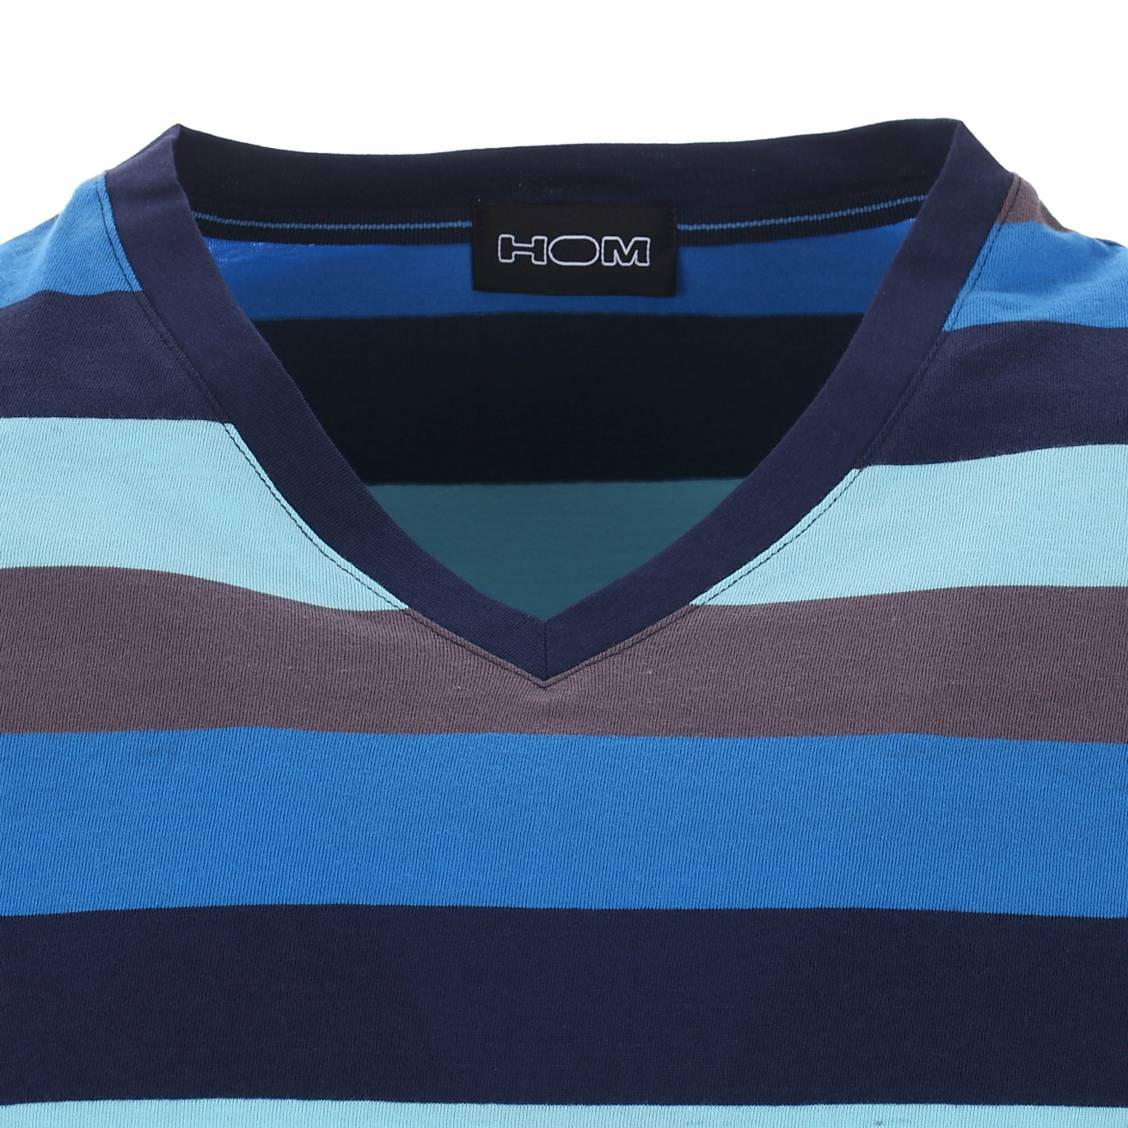 pyjashort hom tee shirt rayures turquoise bleues bleu marine et anthracite short bleu. Black Bedroom Furniture Sets. Home Design Ideas